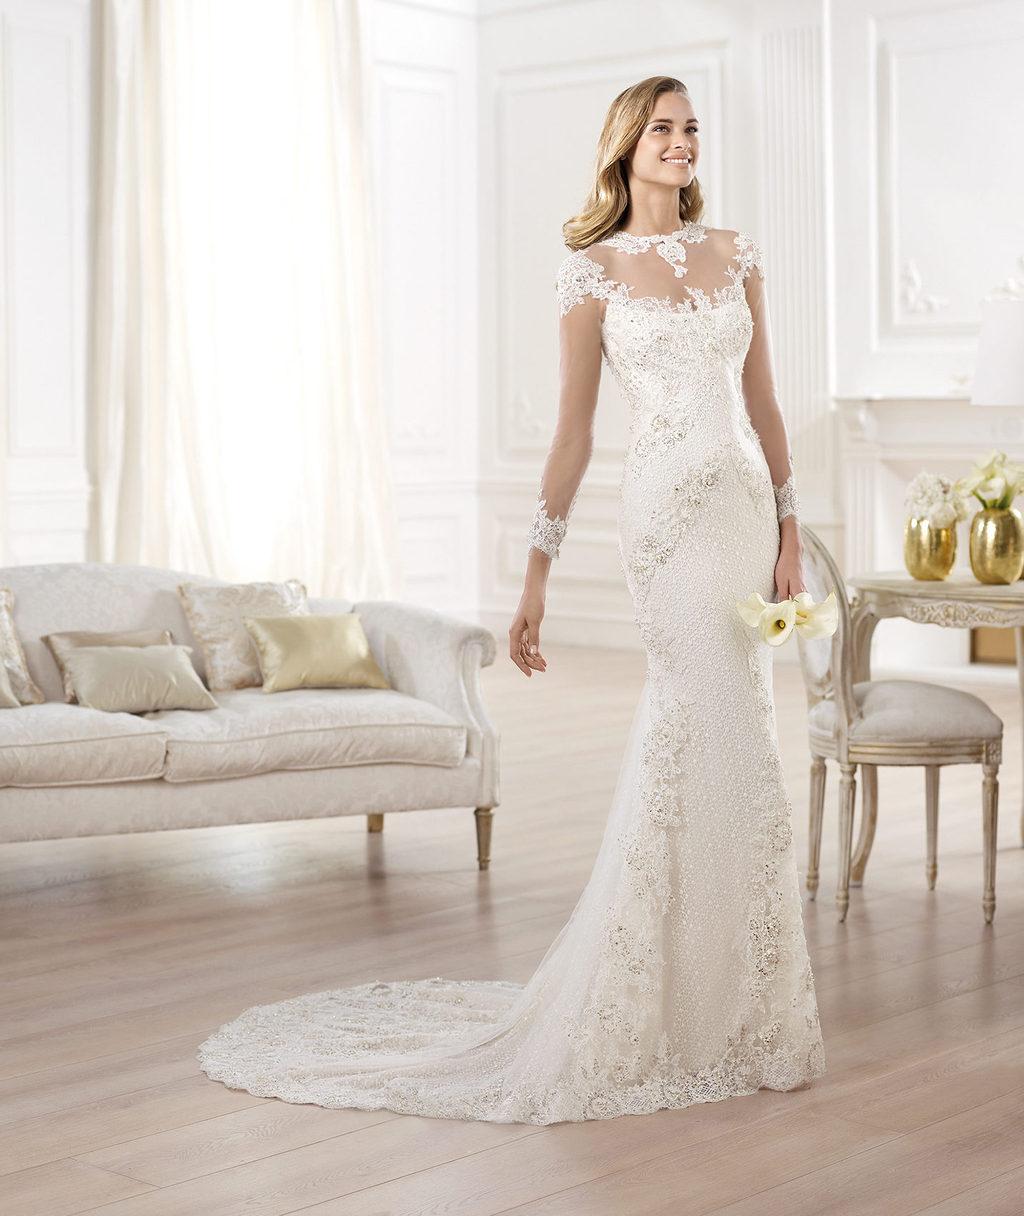 Yanida-wedding-dress-by-atelier-pronovias-2014-bridal-2.full